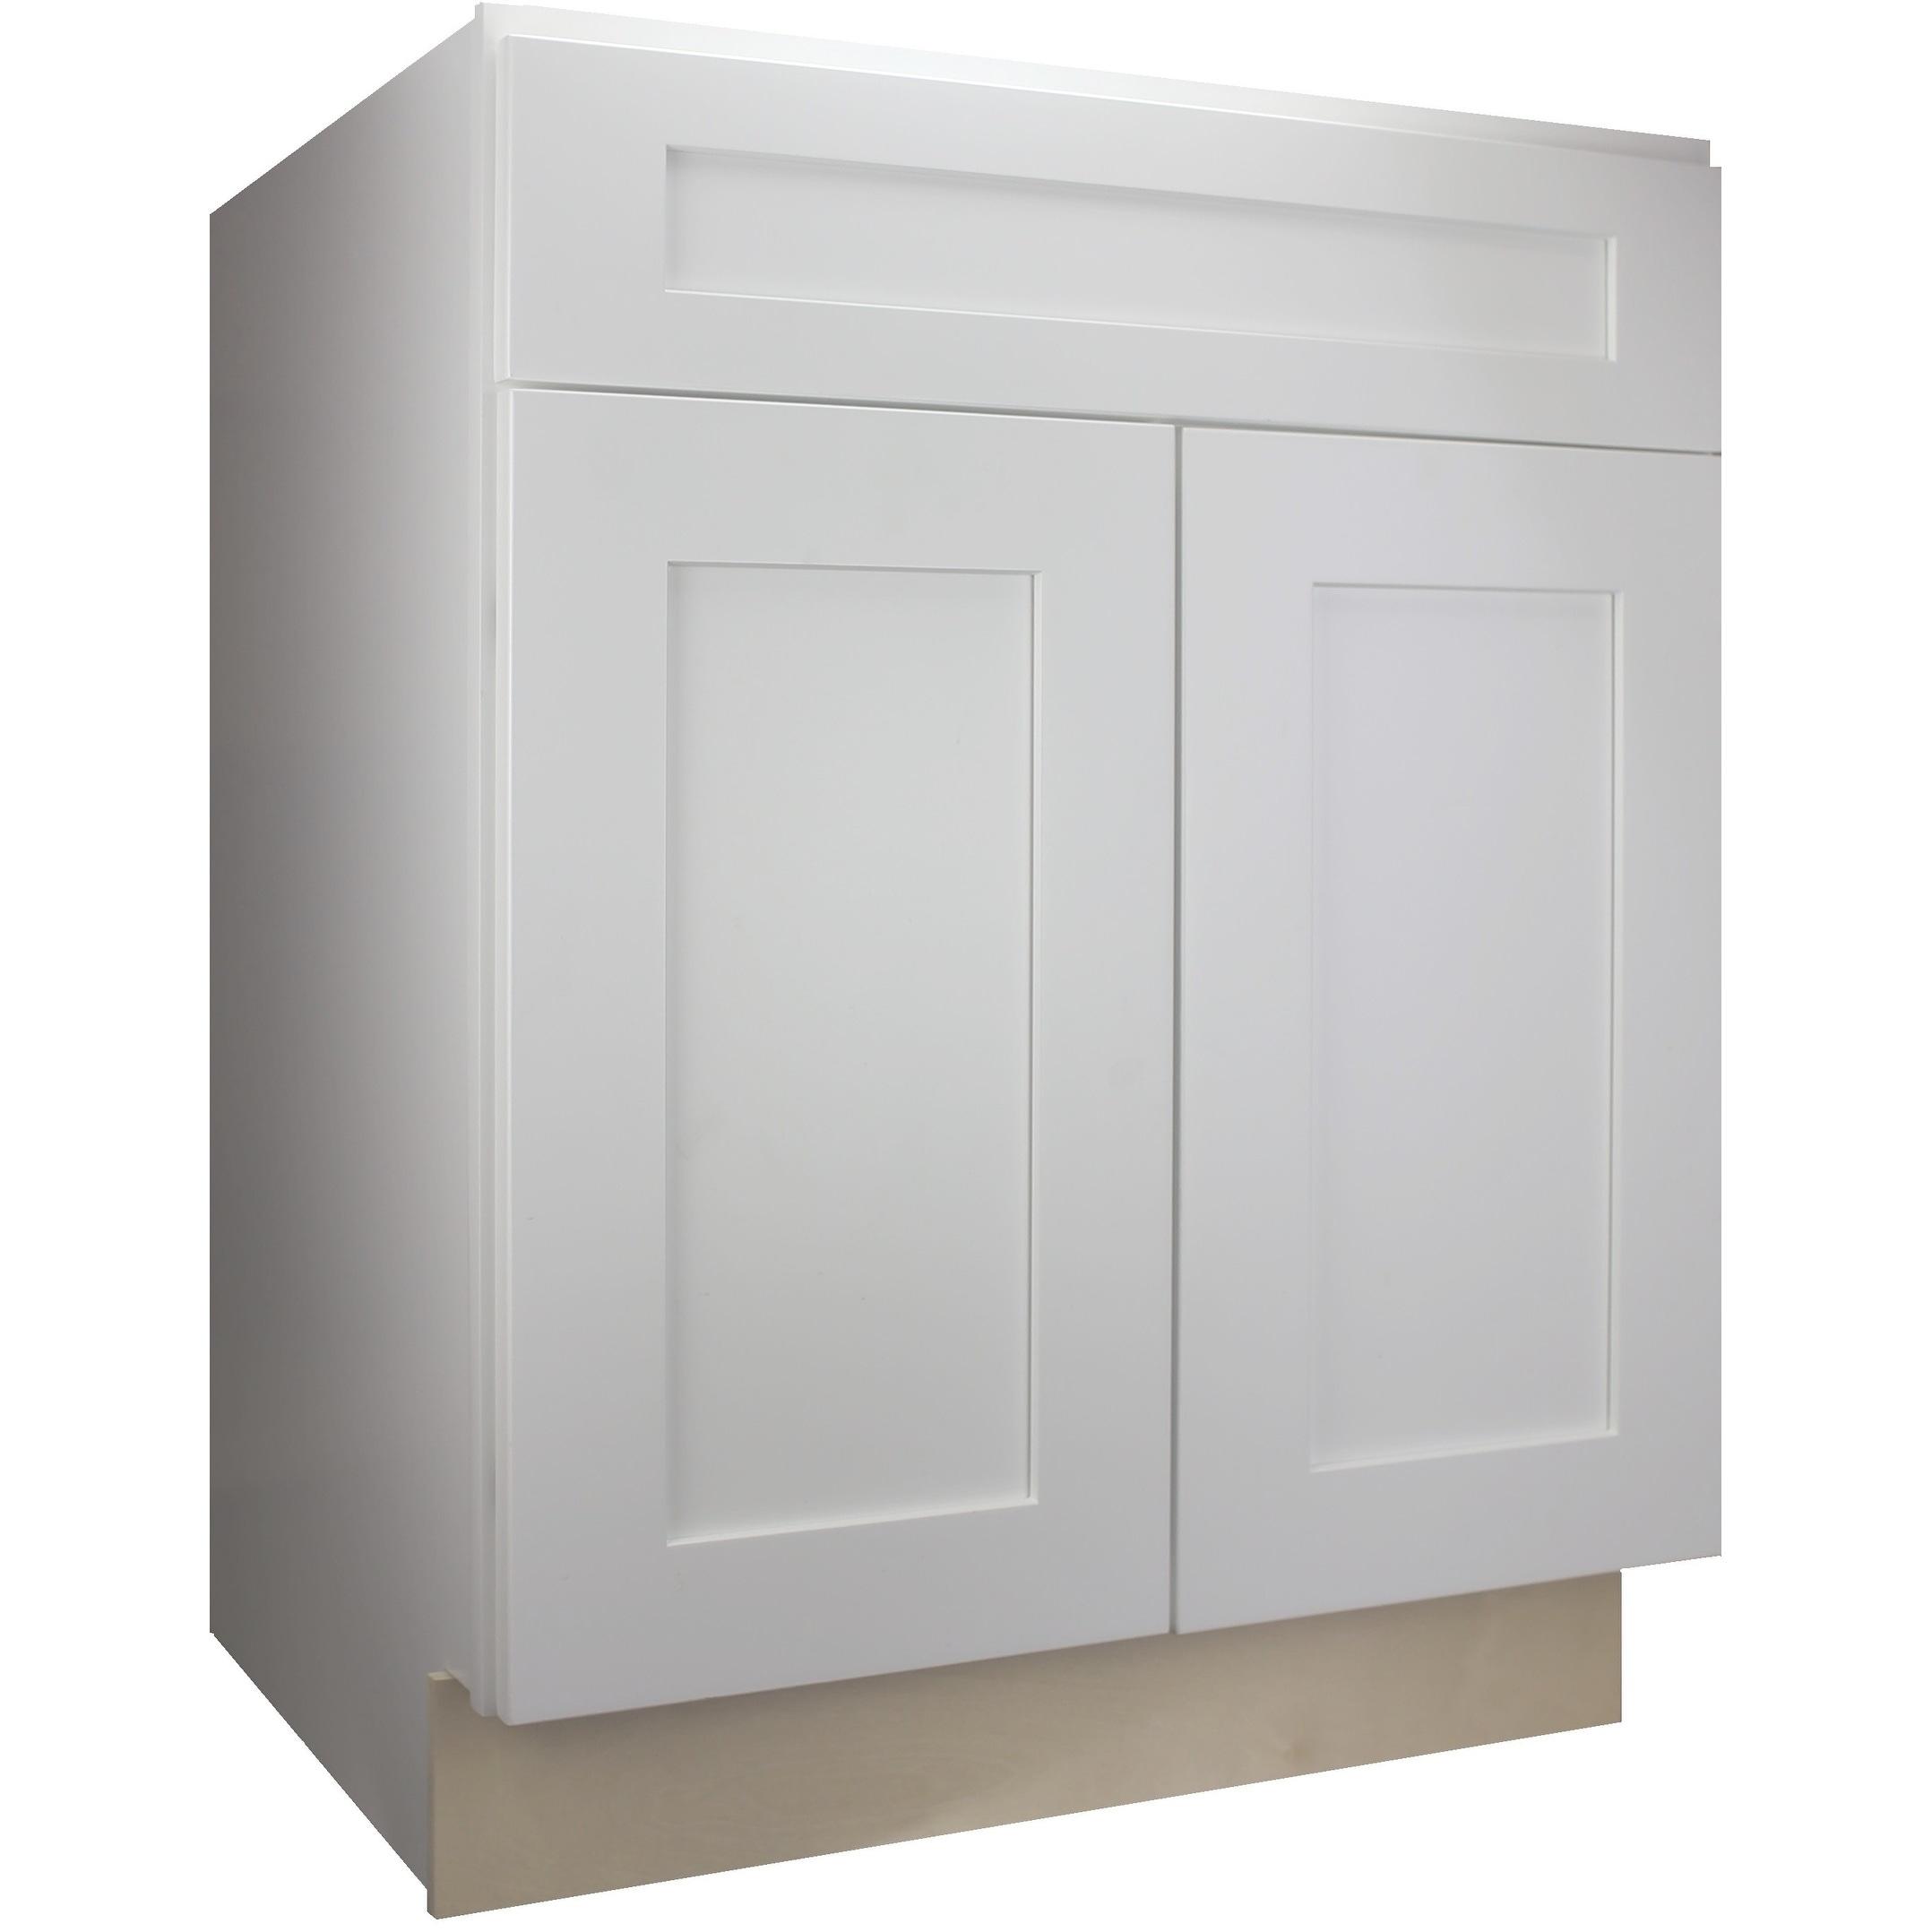 Cabinet Mania White Shaker Kitchen Cabinet Base 30 W X 34 5 H X 24 D